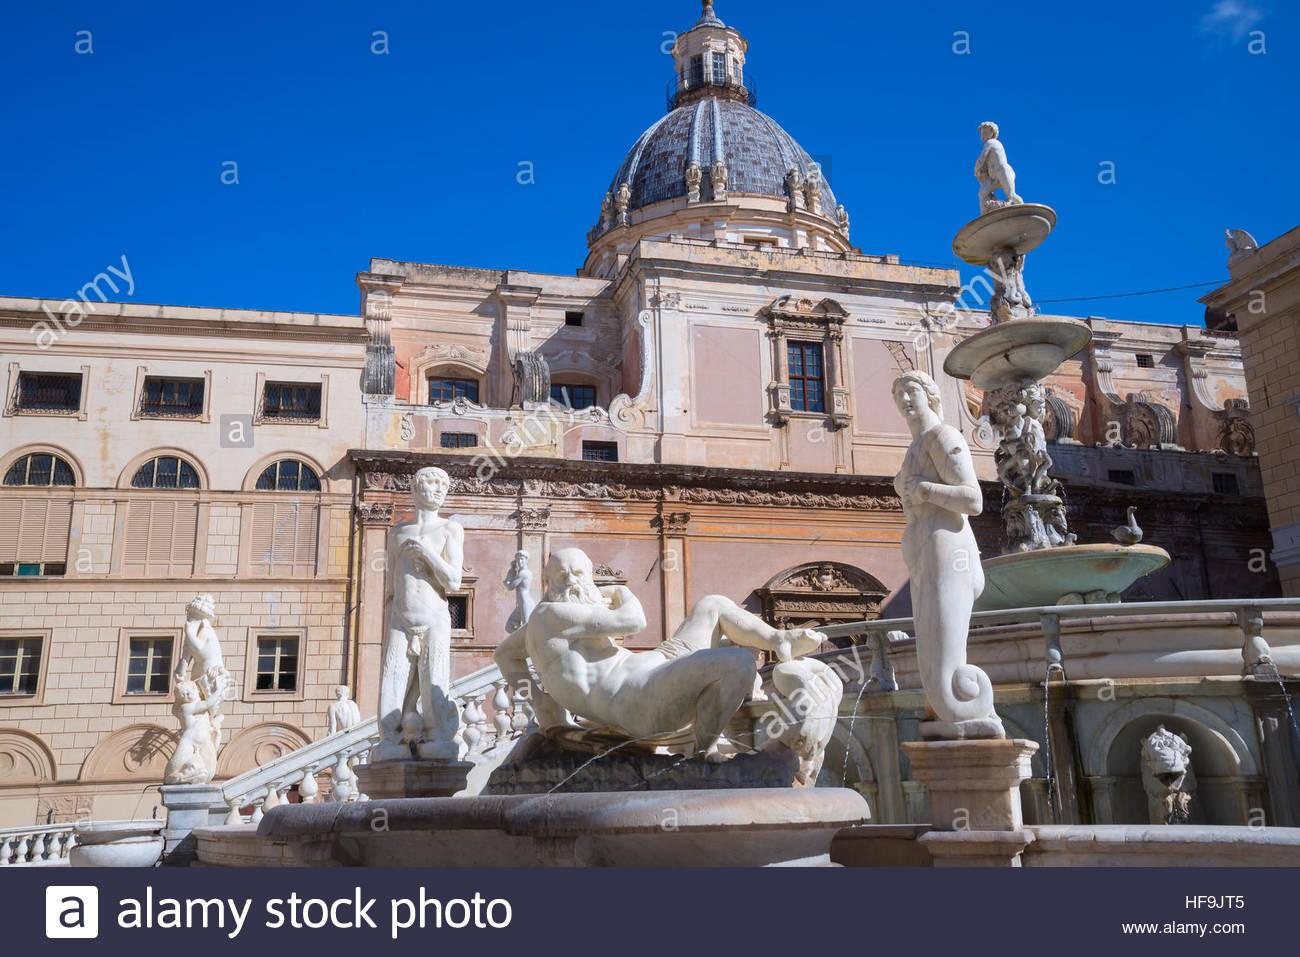 La Piazza Pretoria, Palerme, Sicile, Italie, Europe, Photo Stock